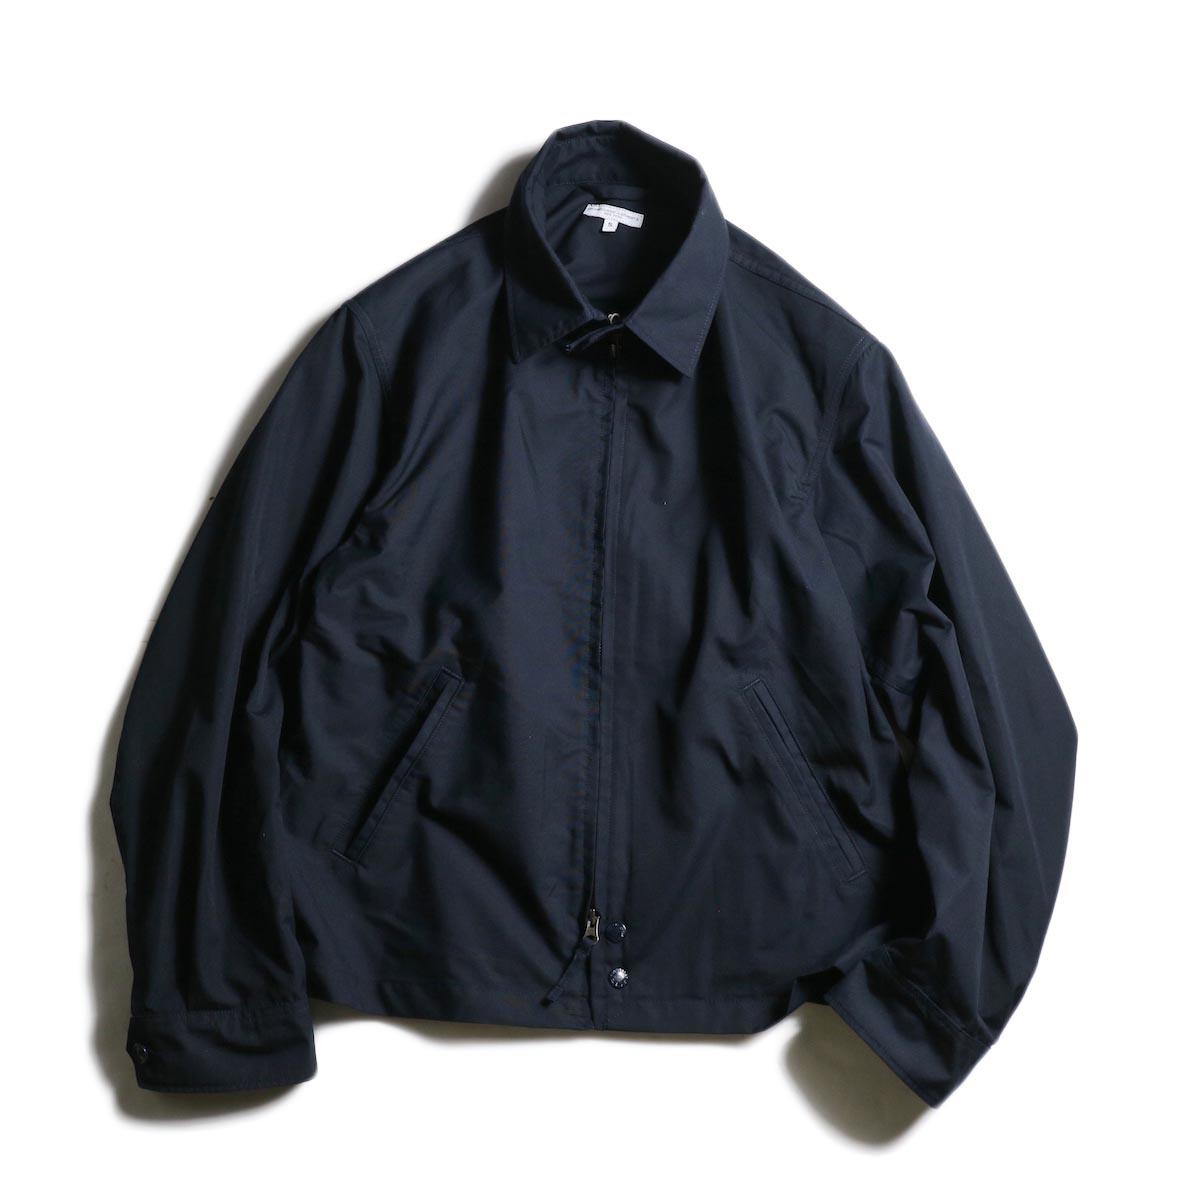 Engineered Garments / Claigton Jacket -PC Poplin (Dk.Navy)